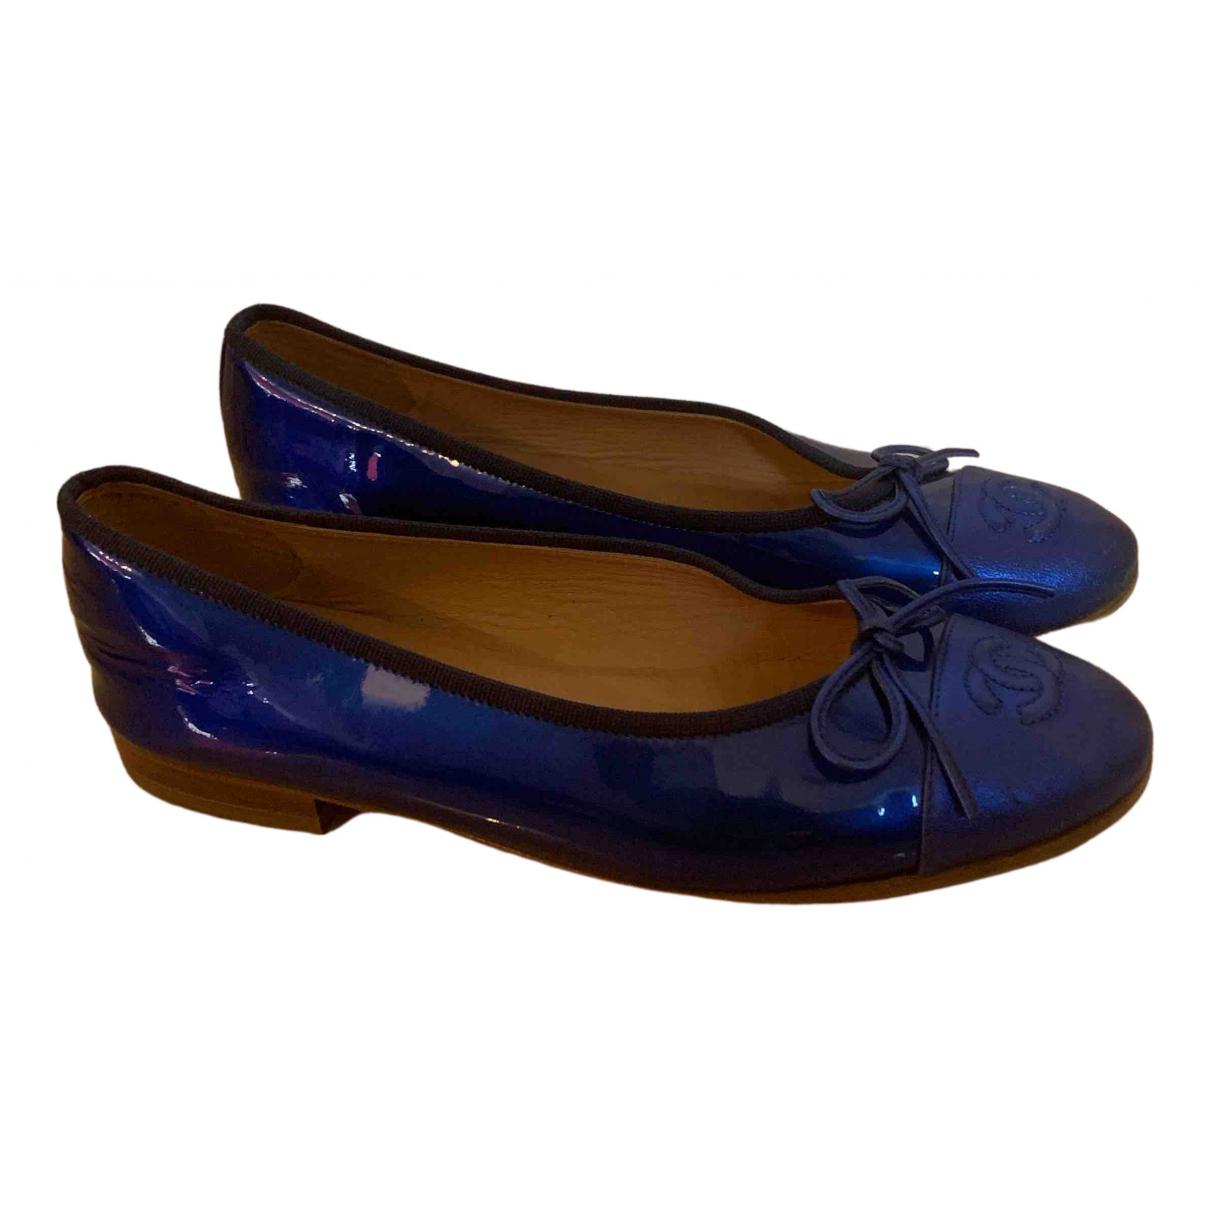 Chanel \N Ballerinas in  Blau Lackleder